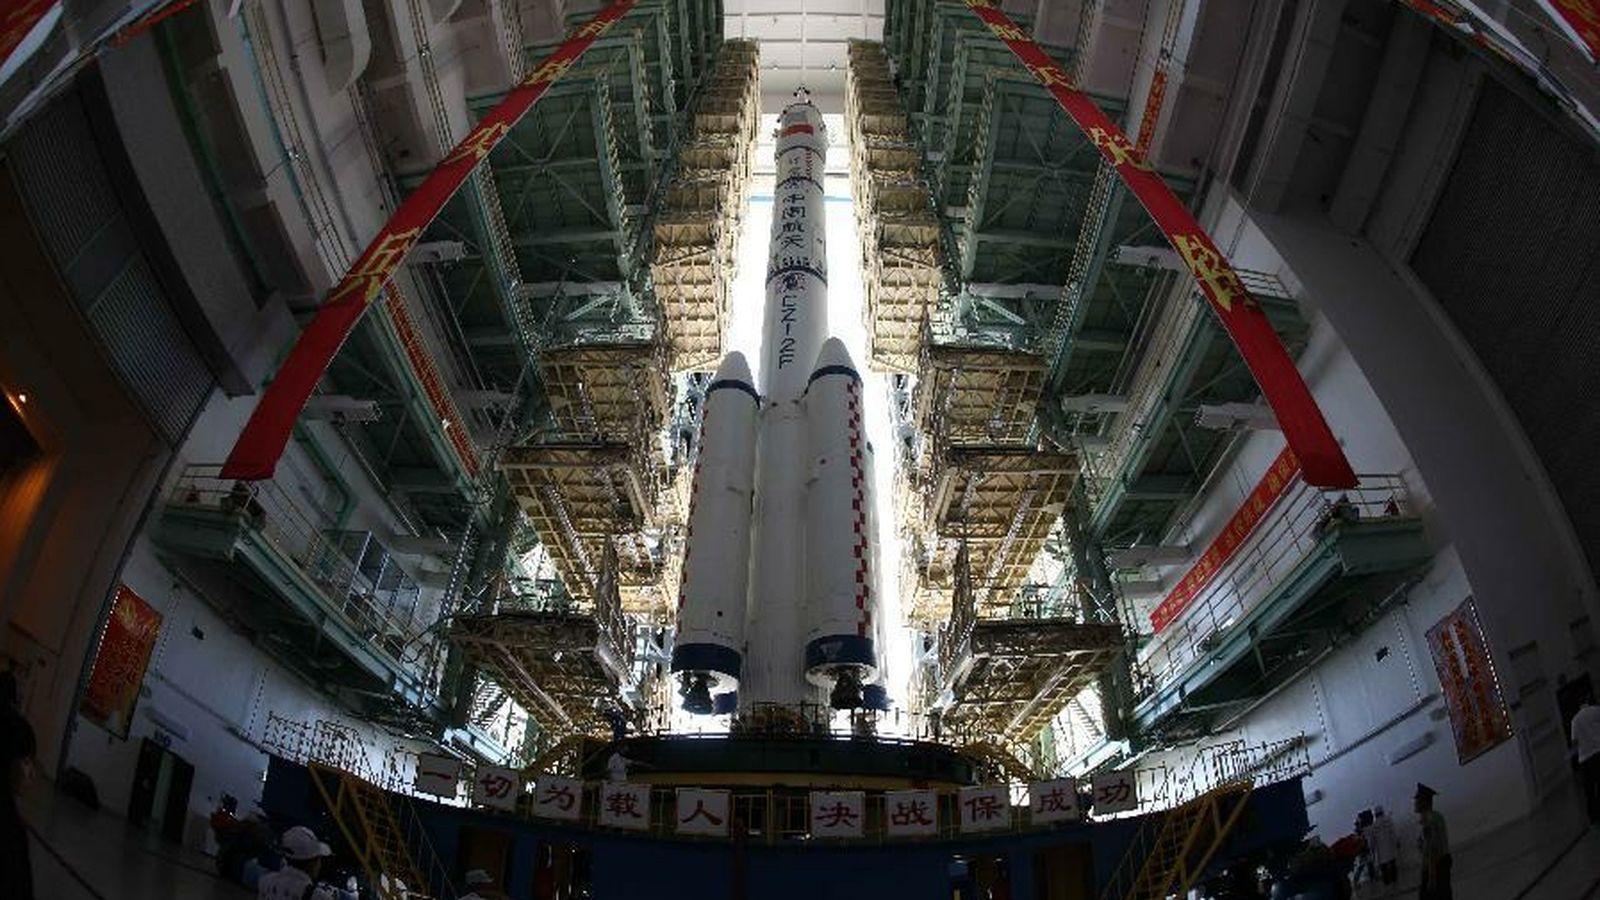 Raketa-nosač misije Šenčou 9 pred lansiranje (Izvor: The Verge)